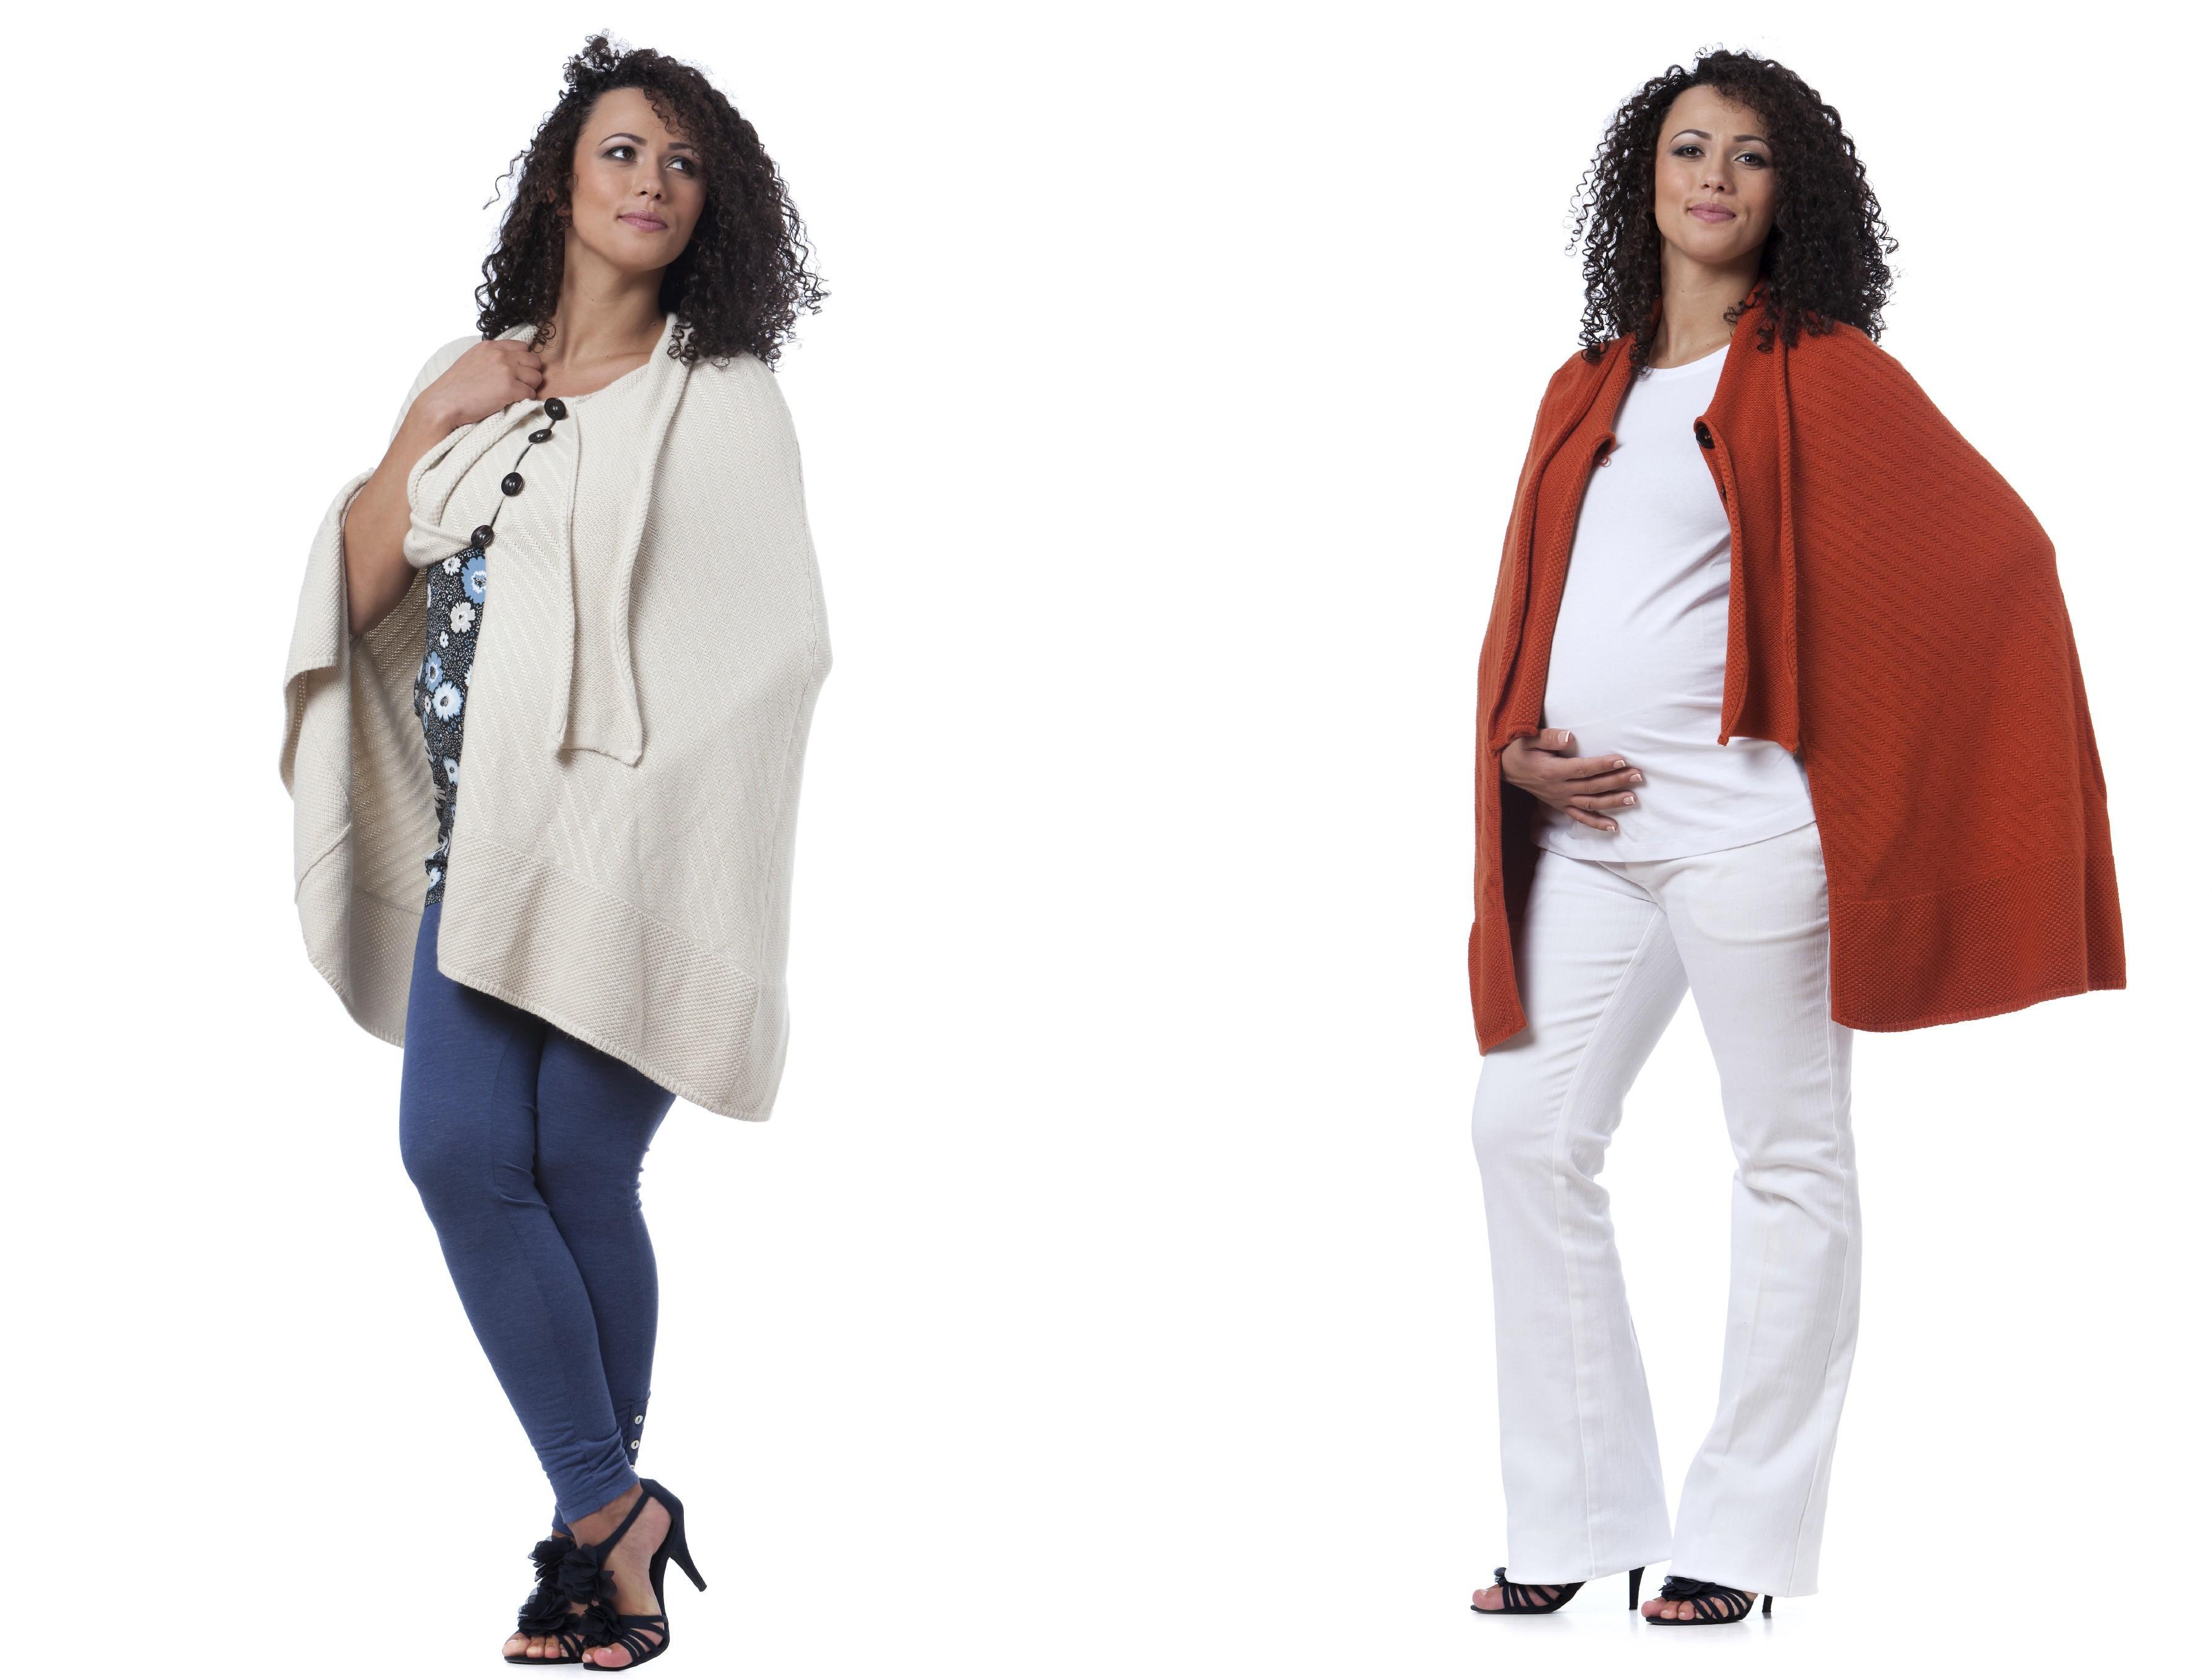 3410c7e33ef16 ملابس الحمل  كيف تختارين ما يناسبك